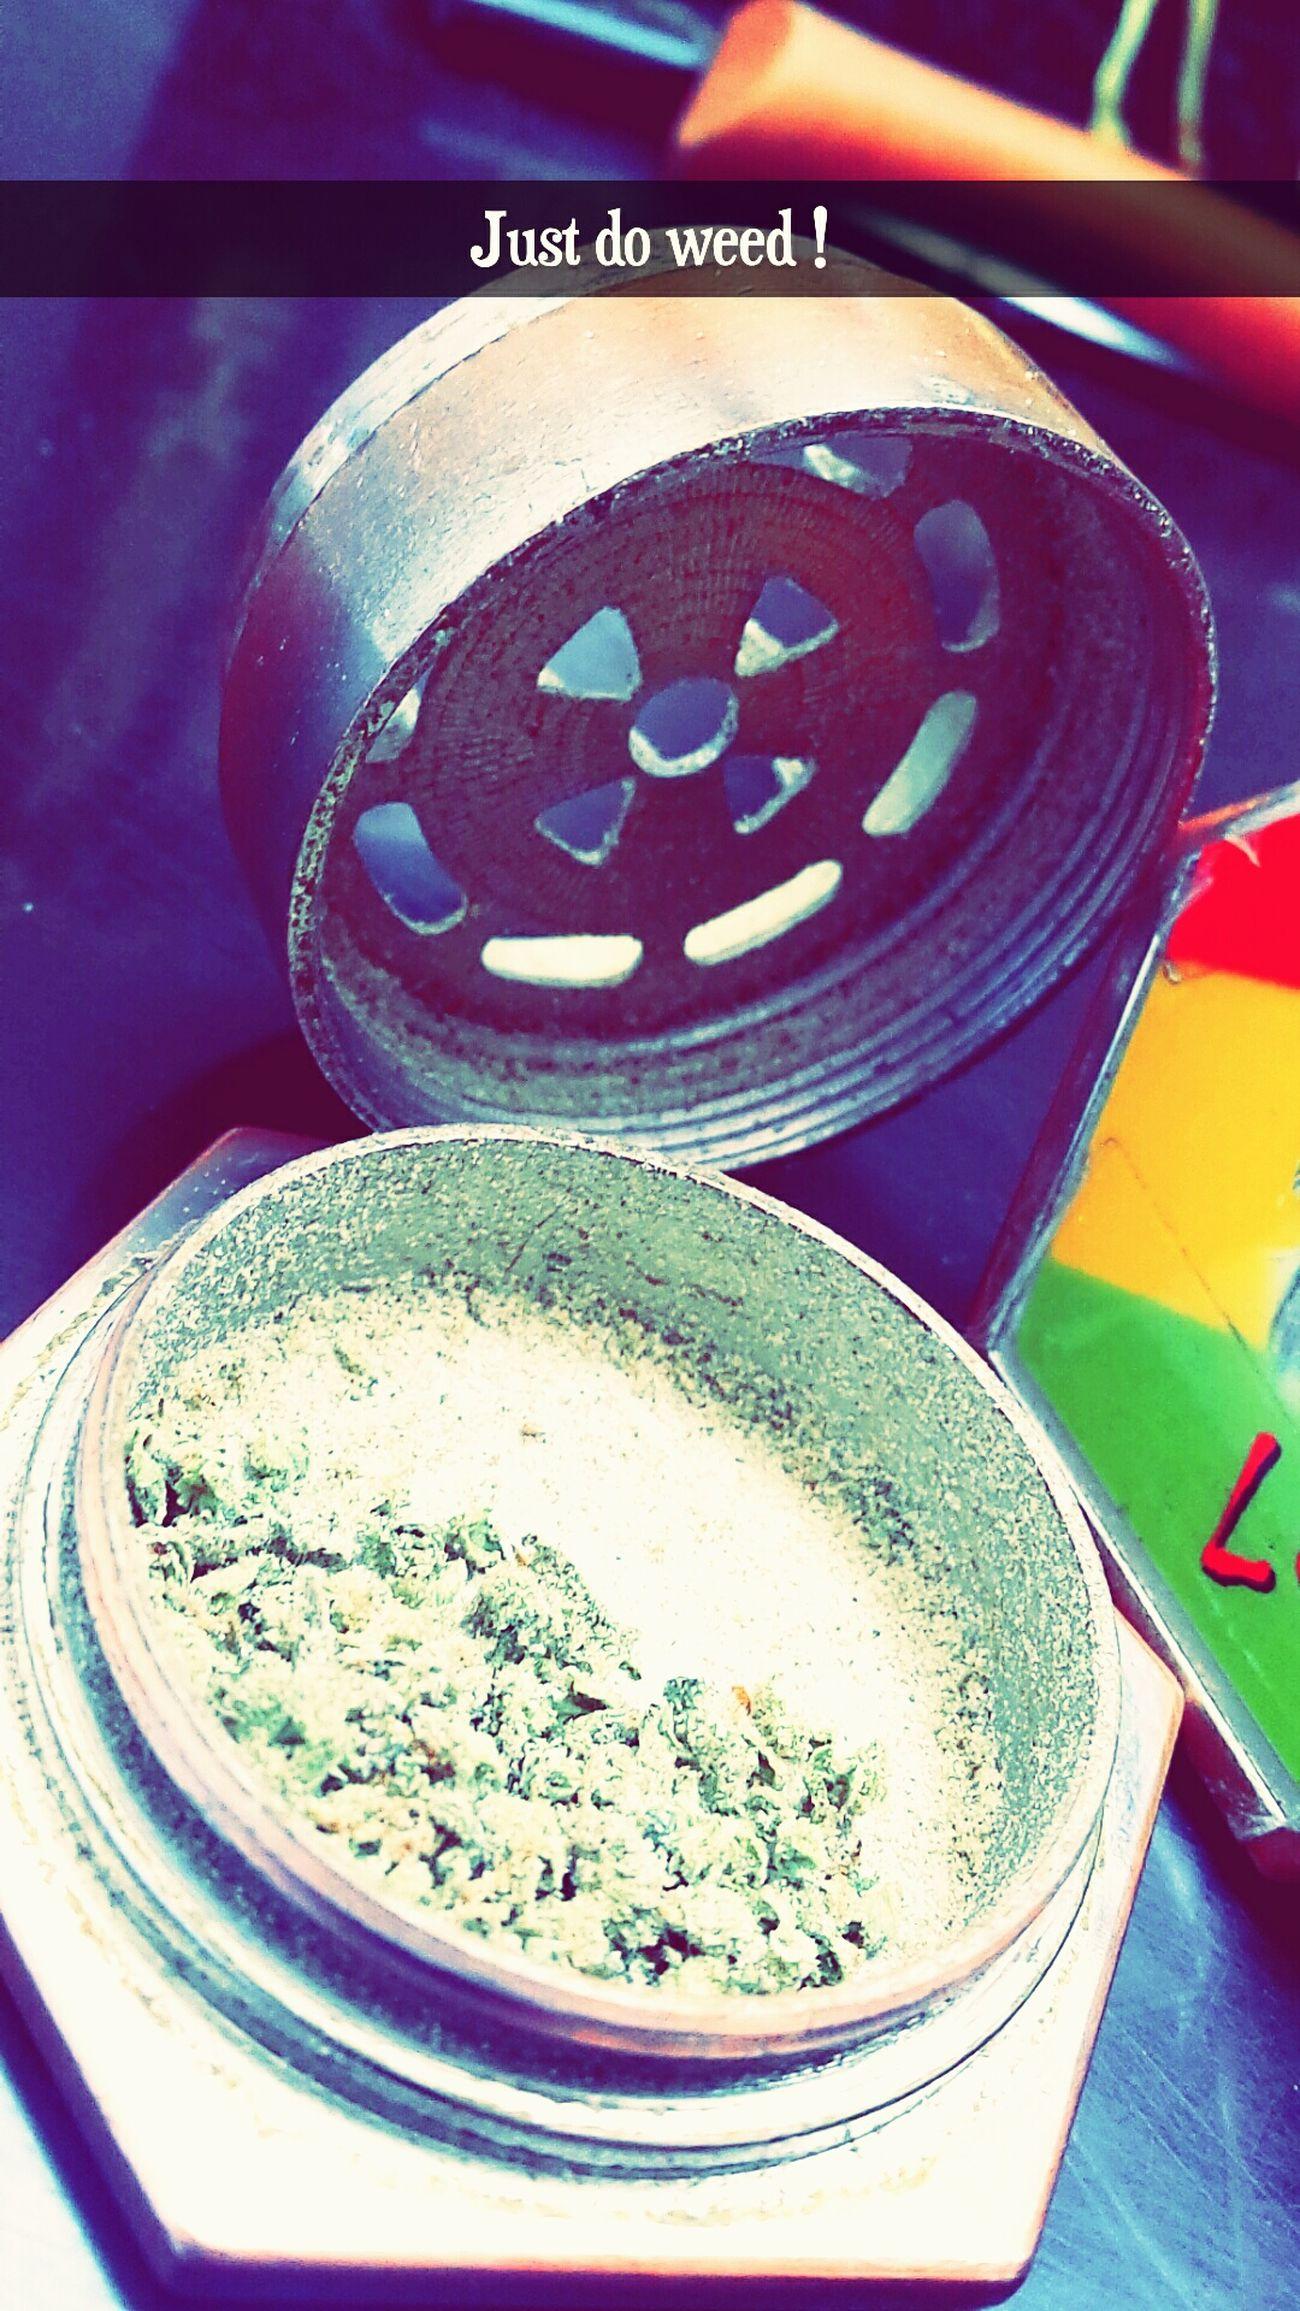 Frenchcloutboyz Grinder Weed Life Poleine Skuff Smokeweedeveryday SMOKE WEED EVERYDAY Smoke Weed Smoking Dope